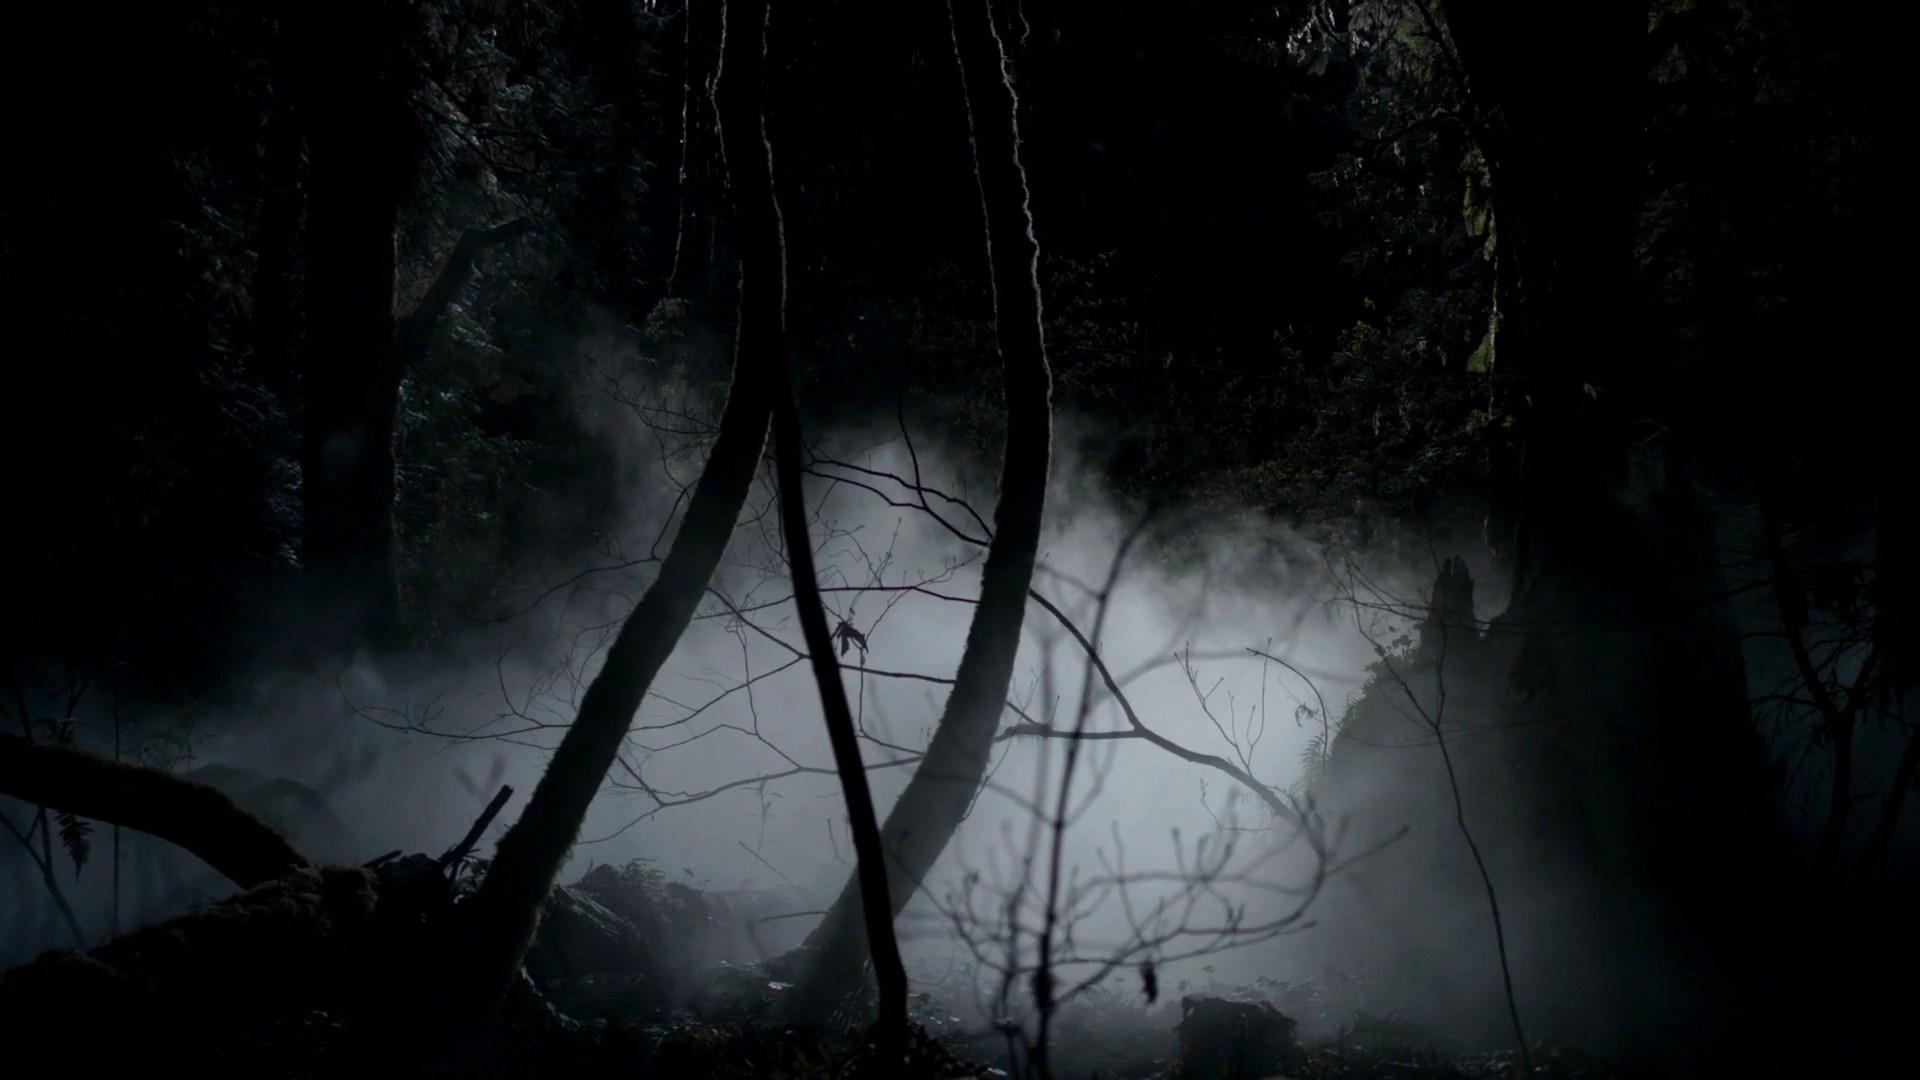 Mystic Falls Wallpaper Woods The Vampire Diaries Wiki Fandom Powered By Wikia